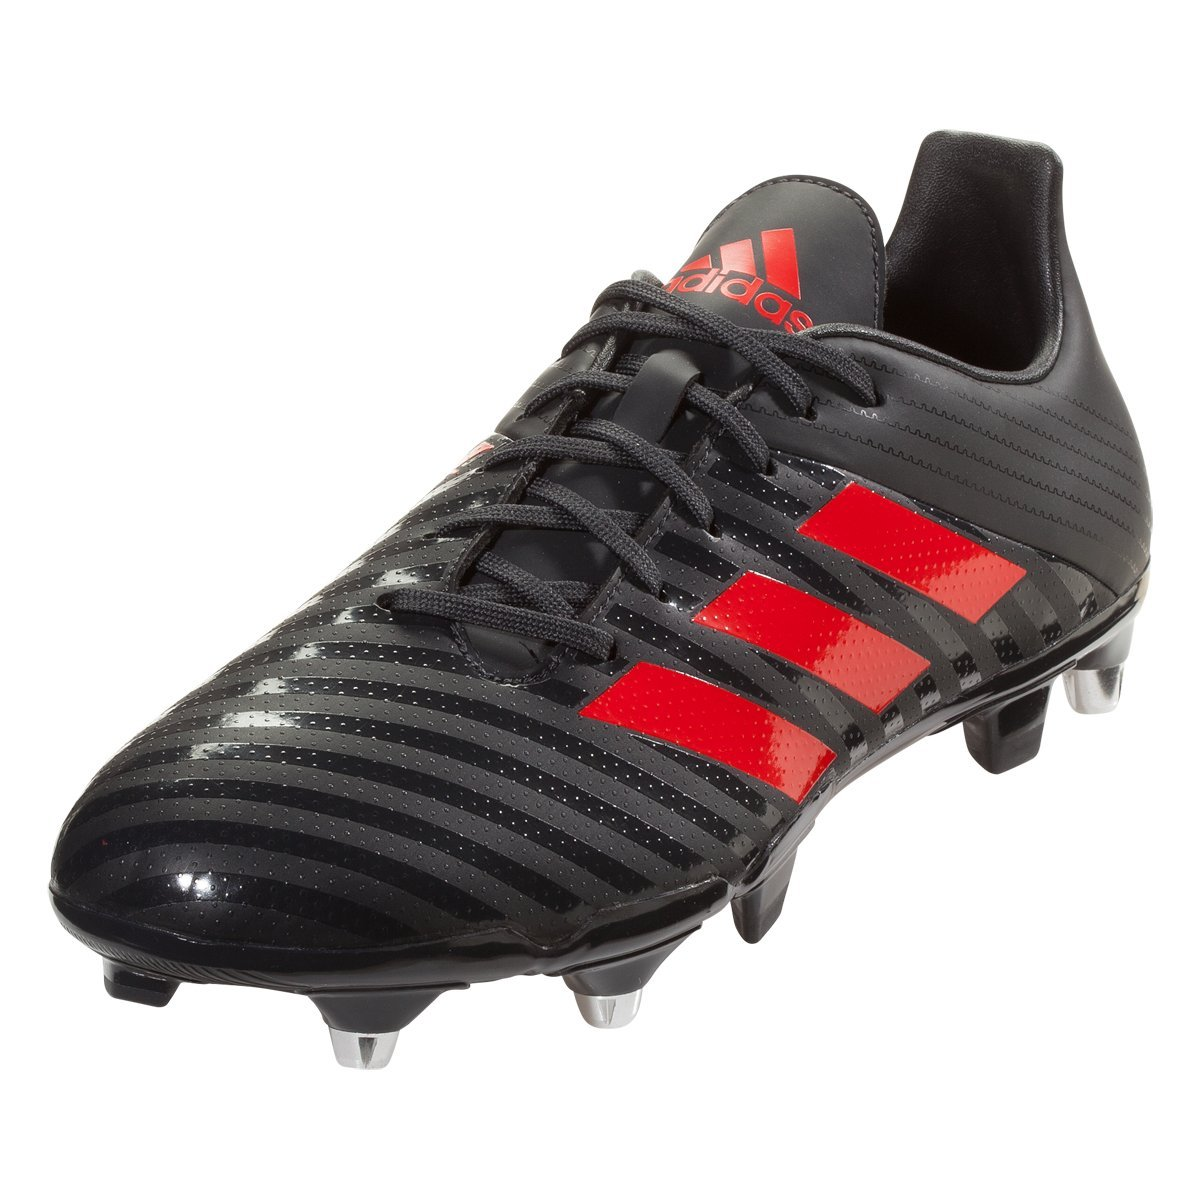 adidas Malice Control SG Rugby Boot CM7467